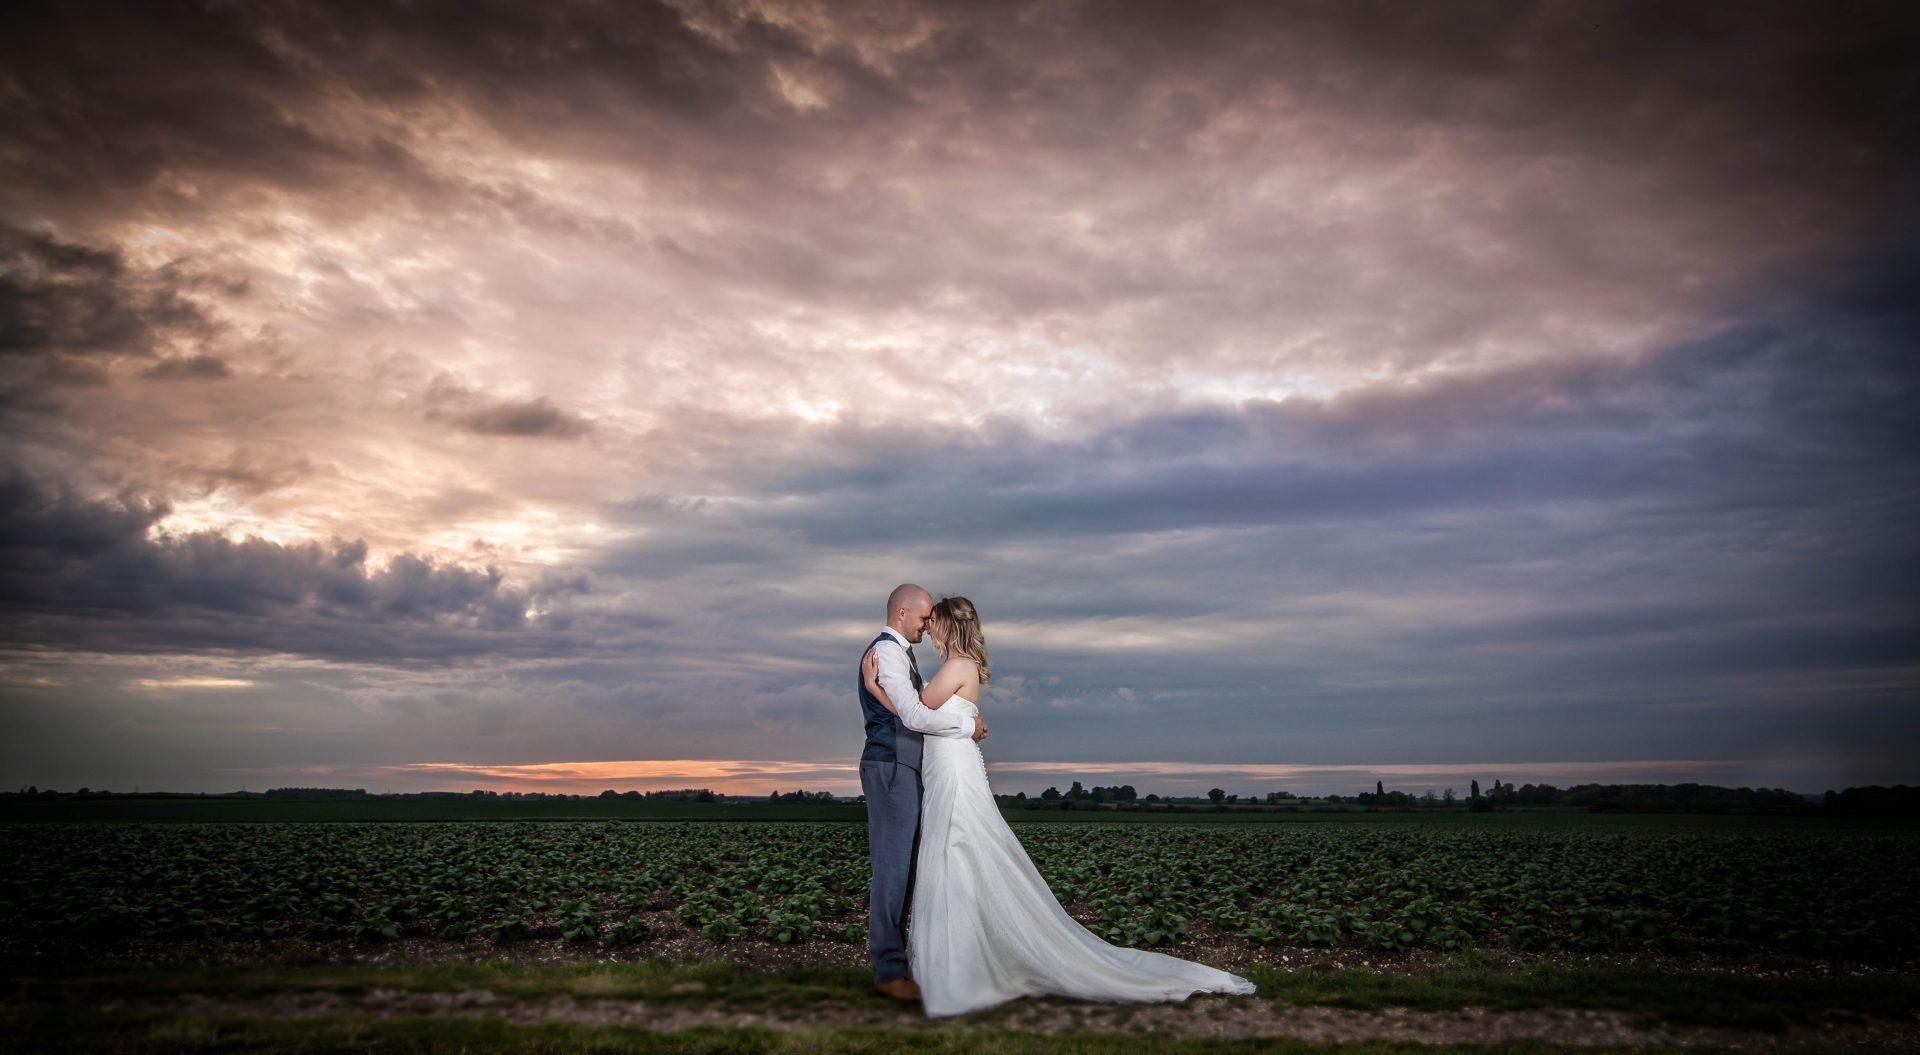 Wedding Photography in in York